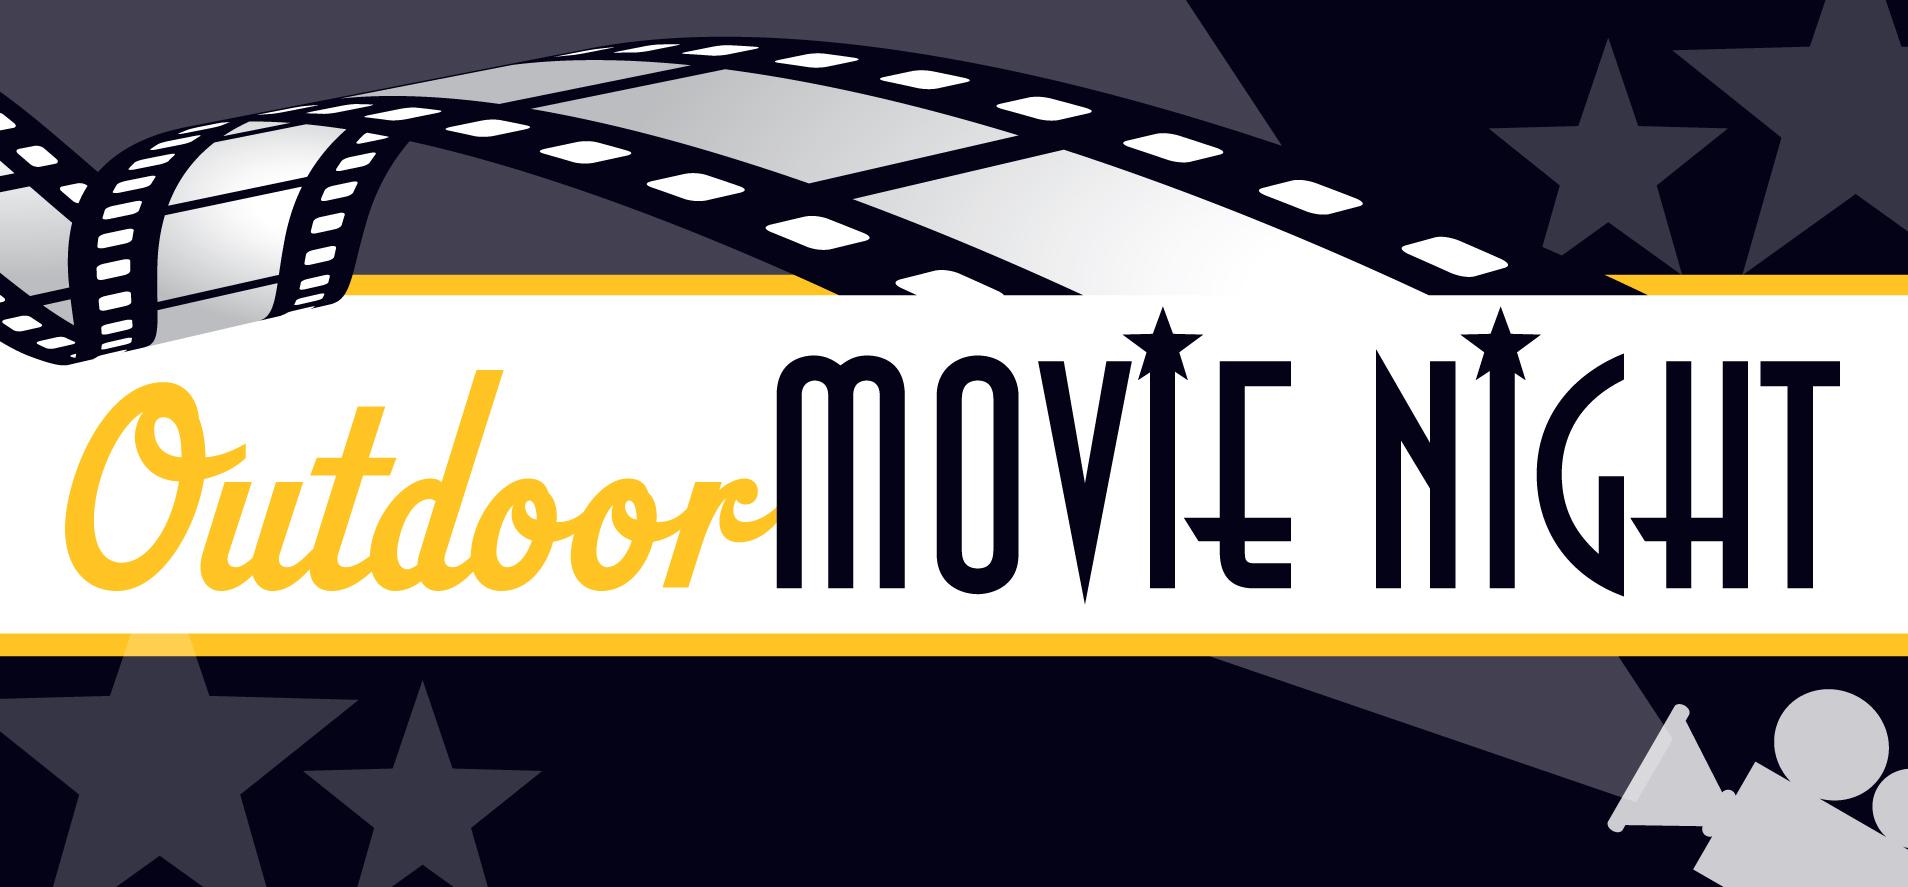 Movie night clip art 4